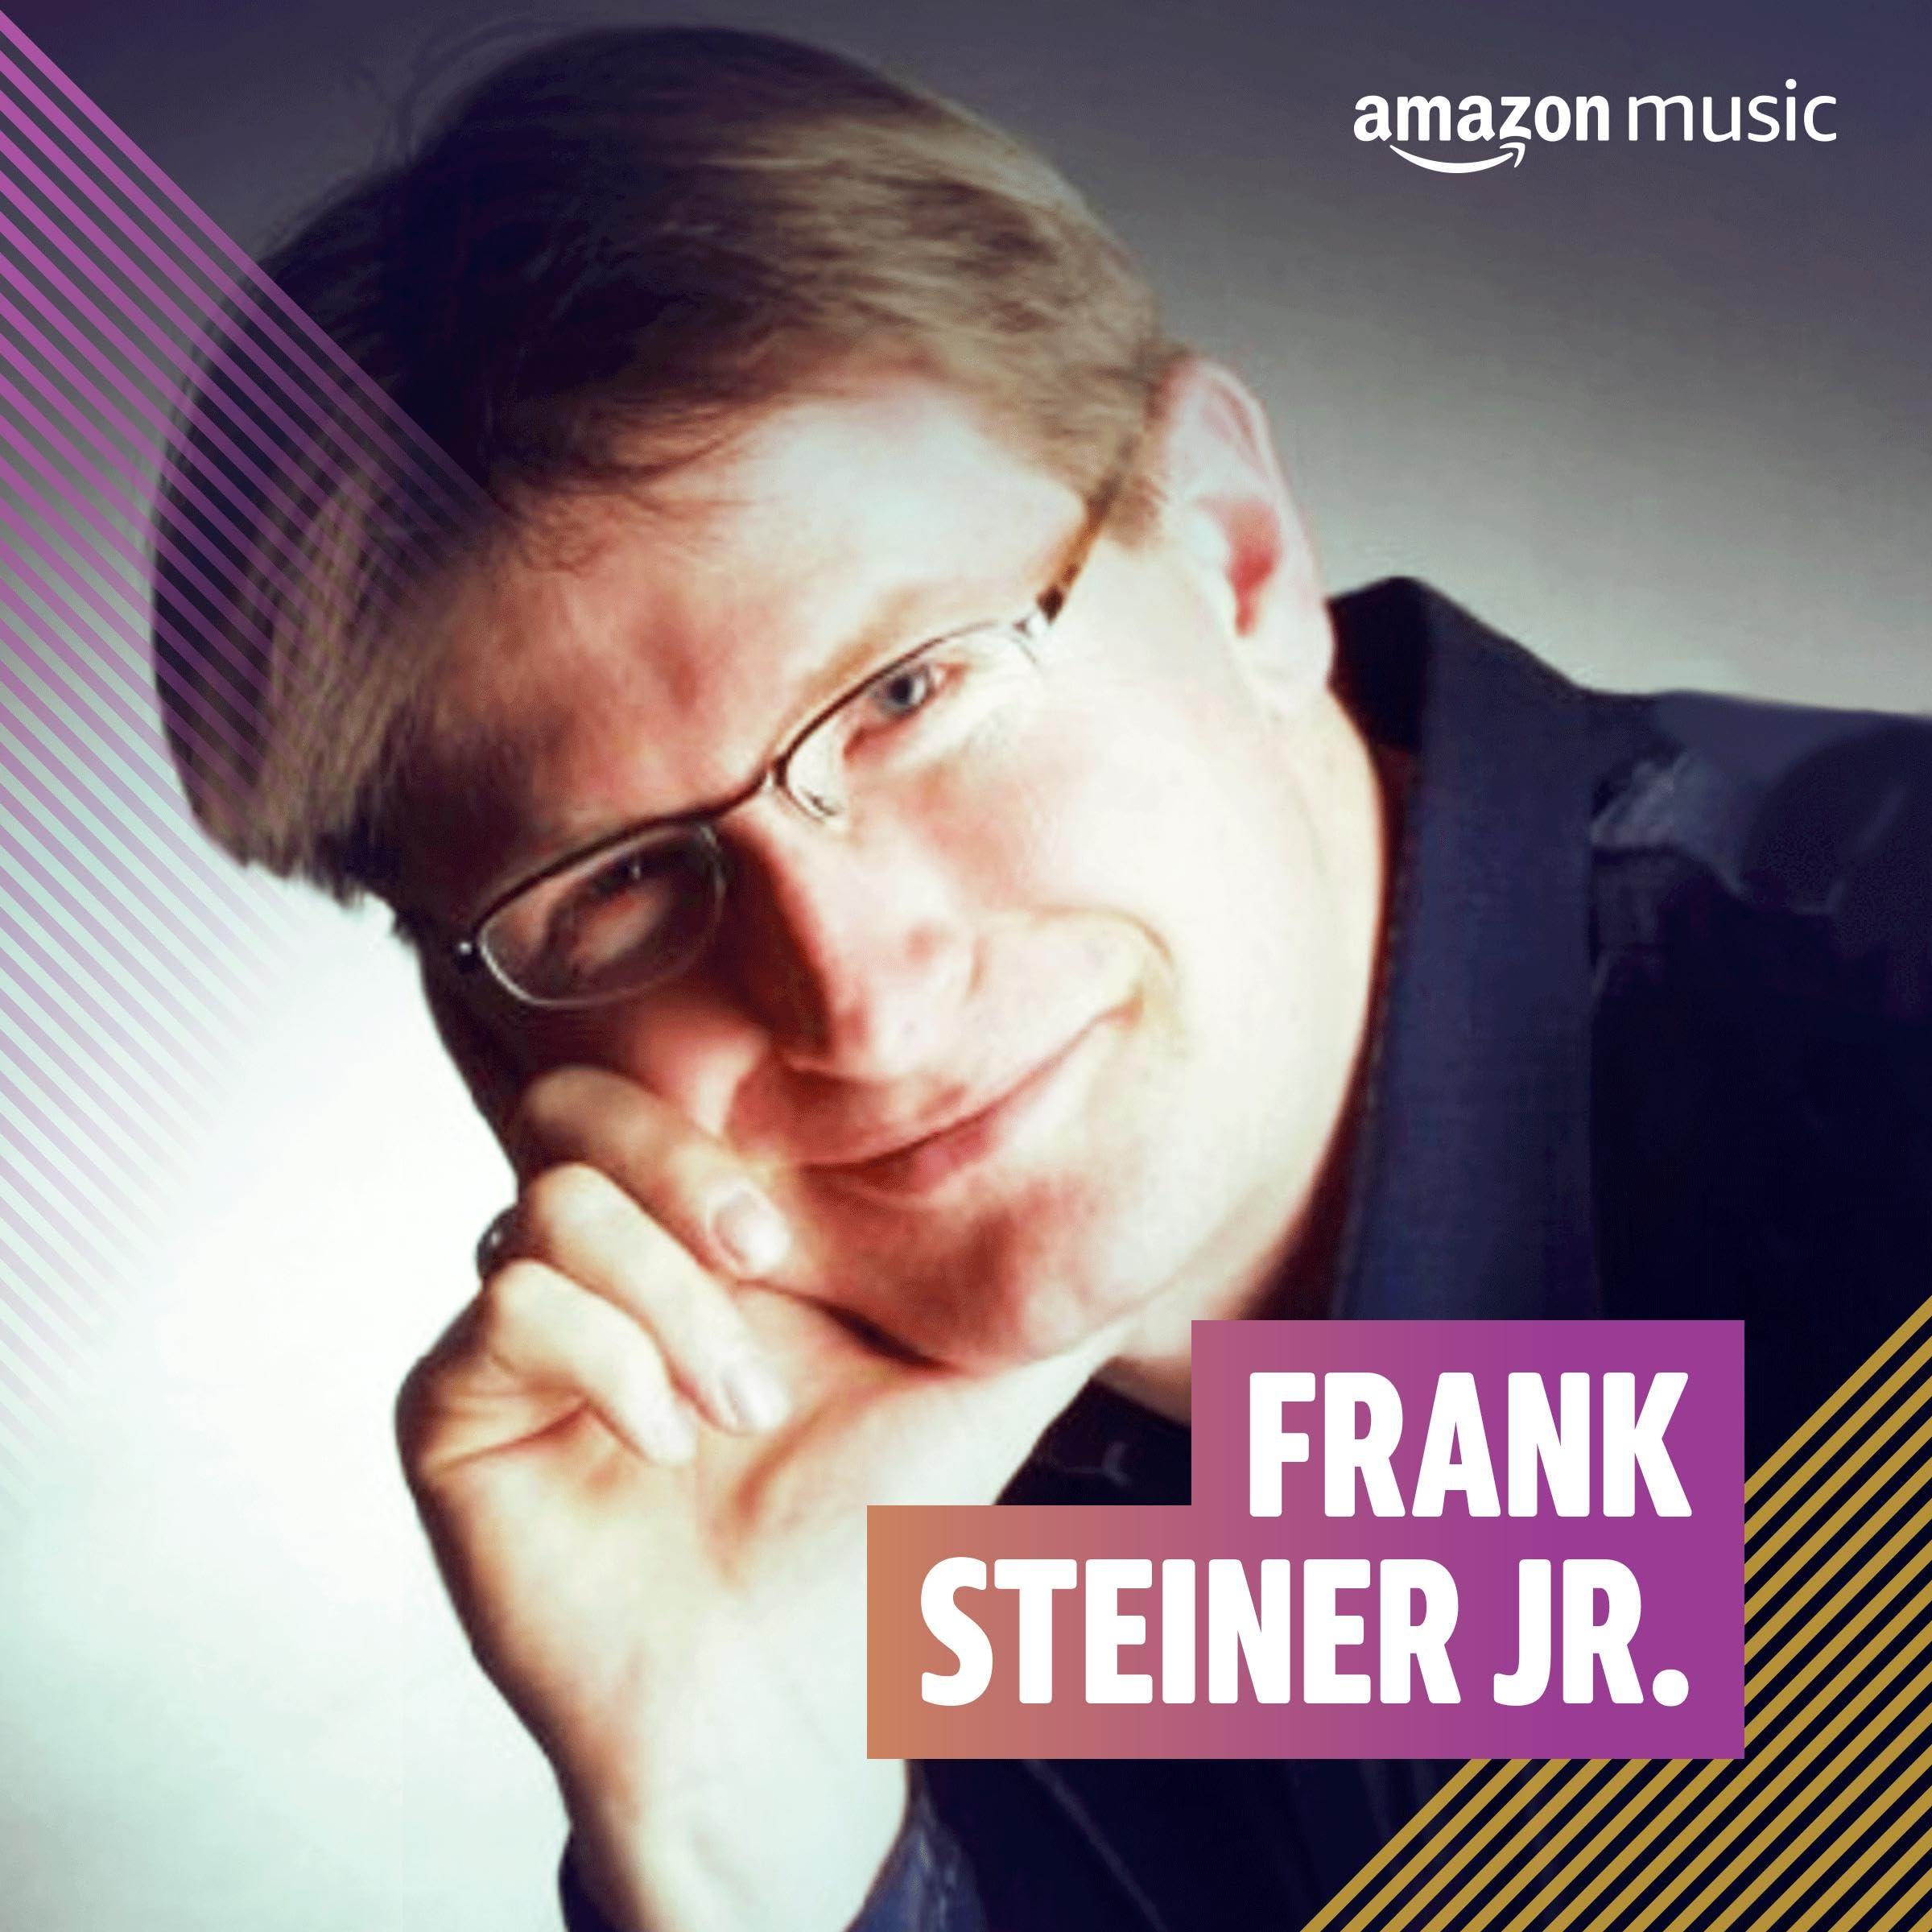 Frank Steiner Jr.